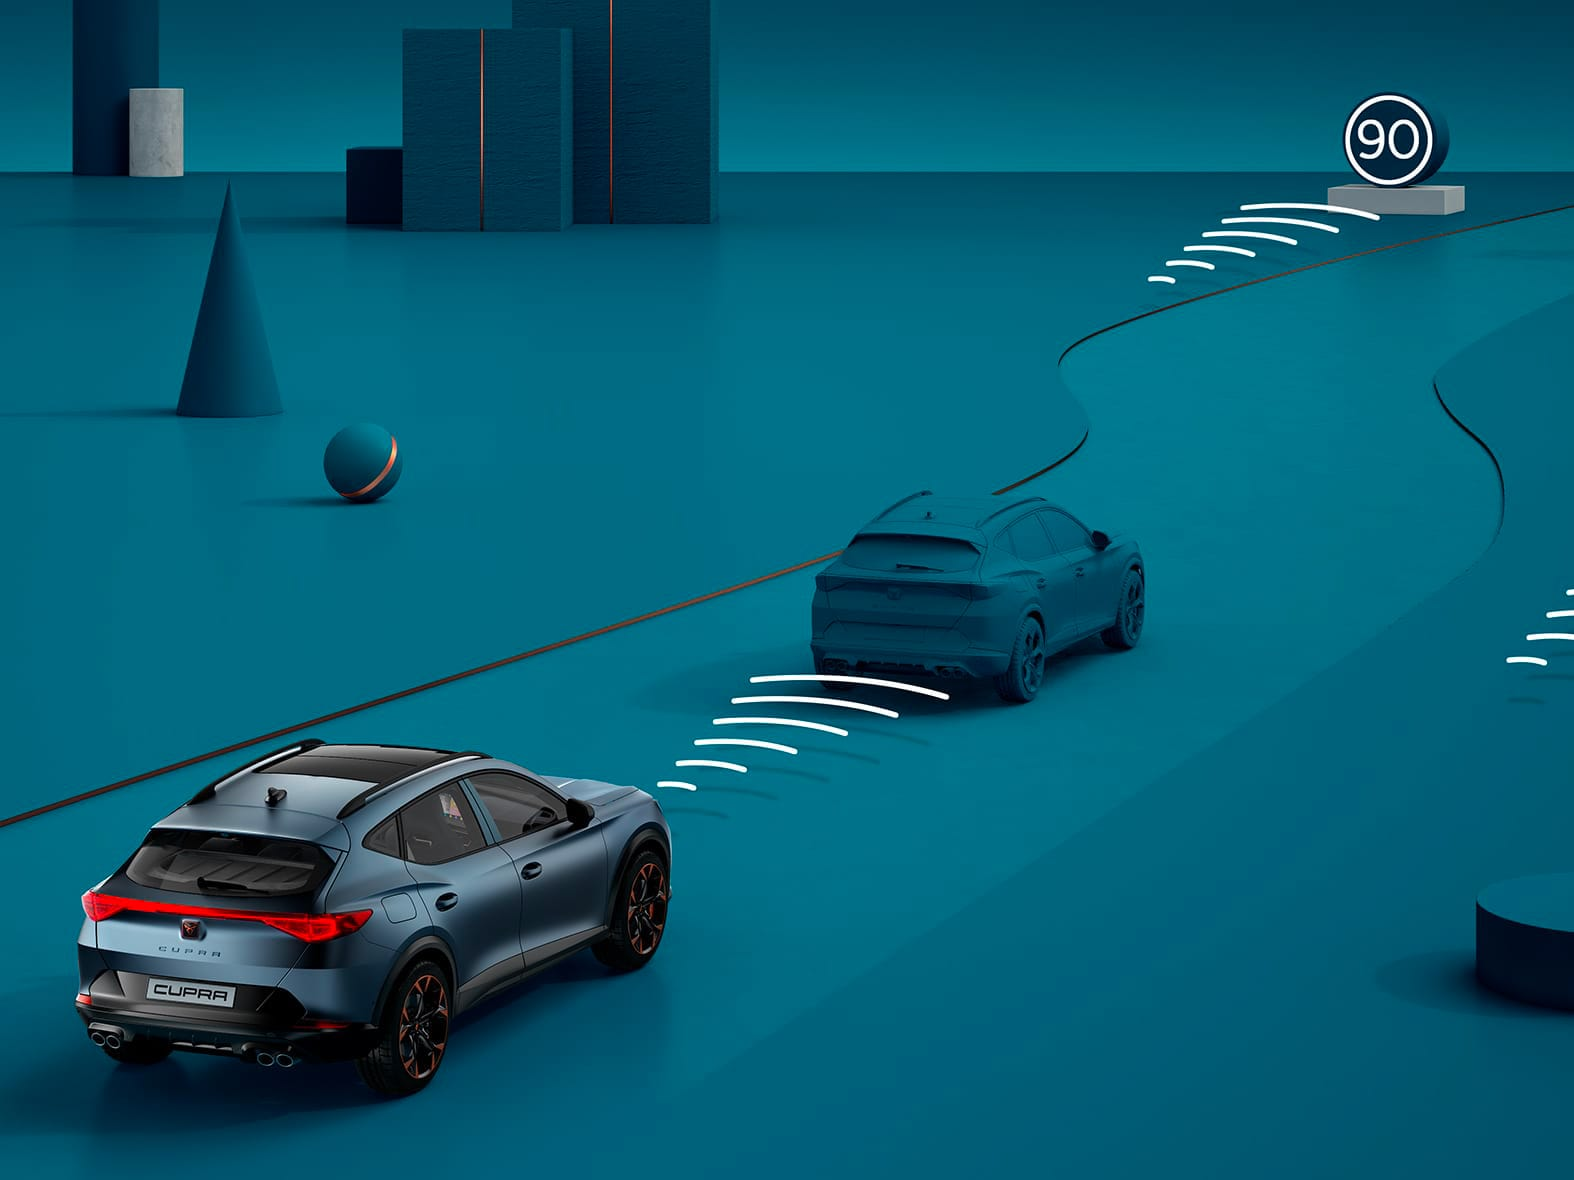 Neuer CUPRA Leon Sportstourer eHybrid Familiensportwagen mit ACC Predictive-Sensoren